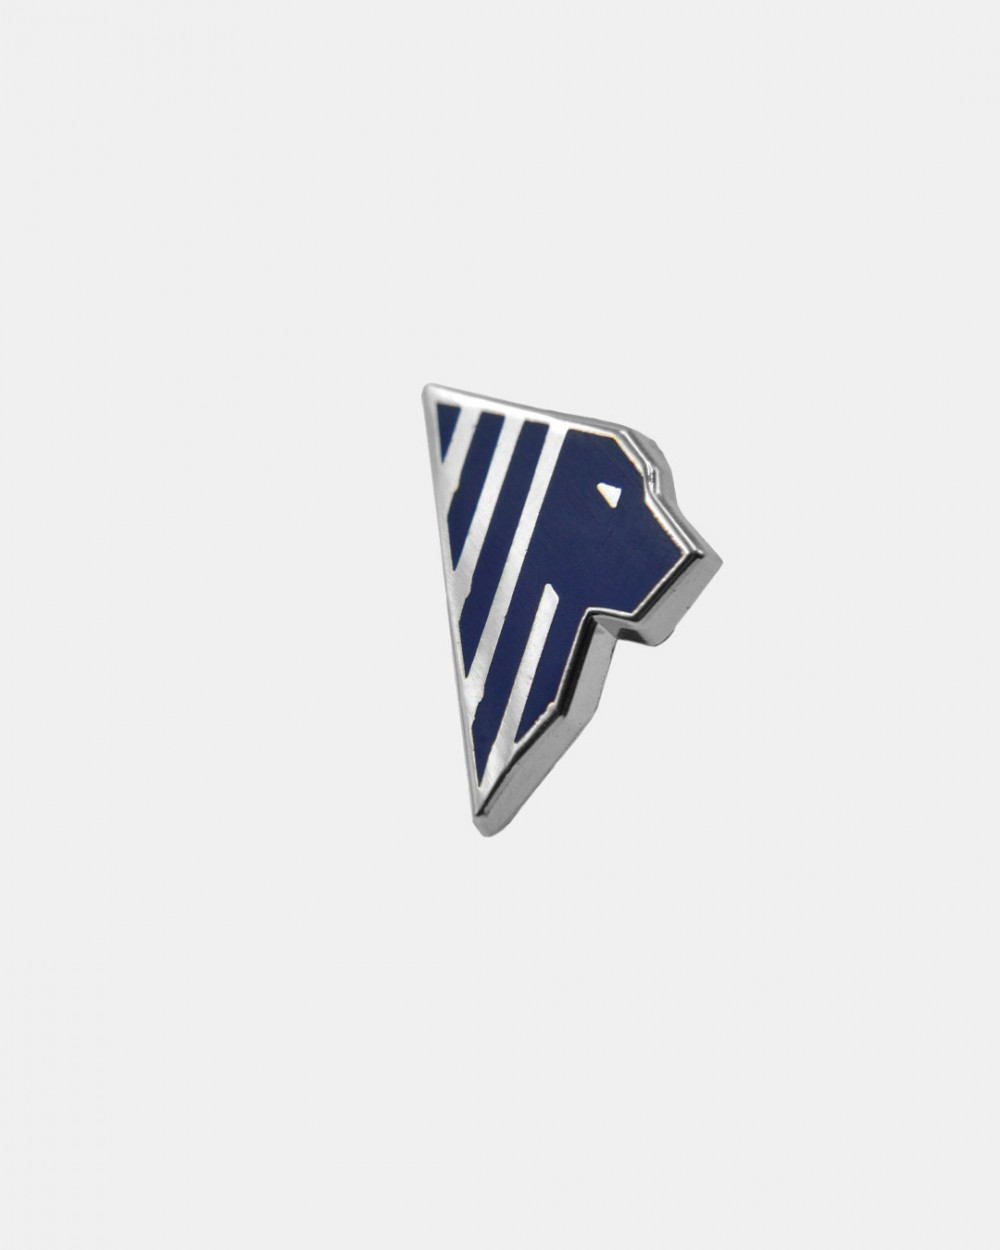 Pin front